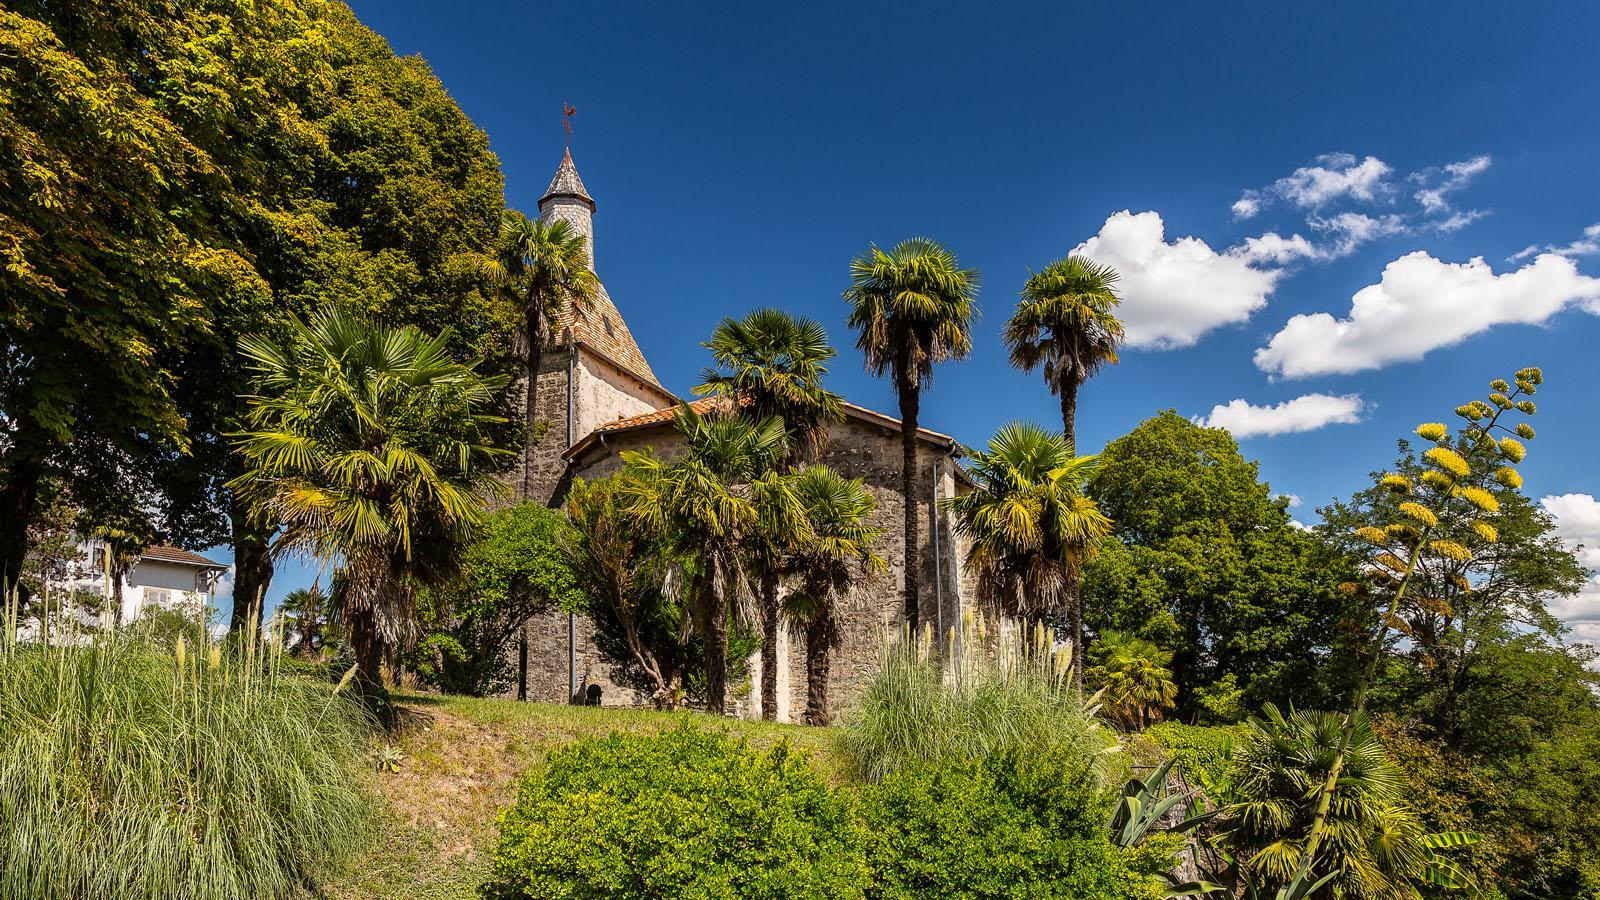 Eglise de Labatut